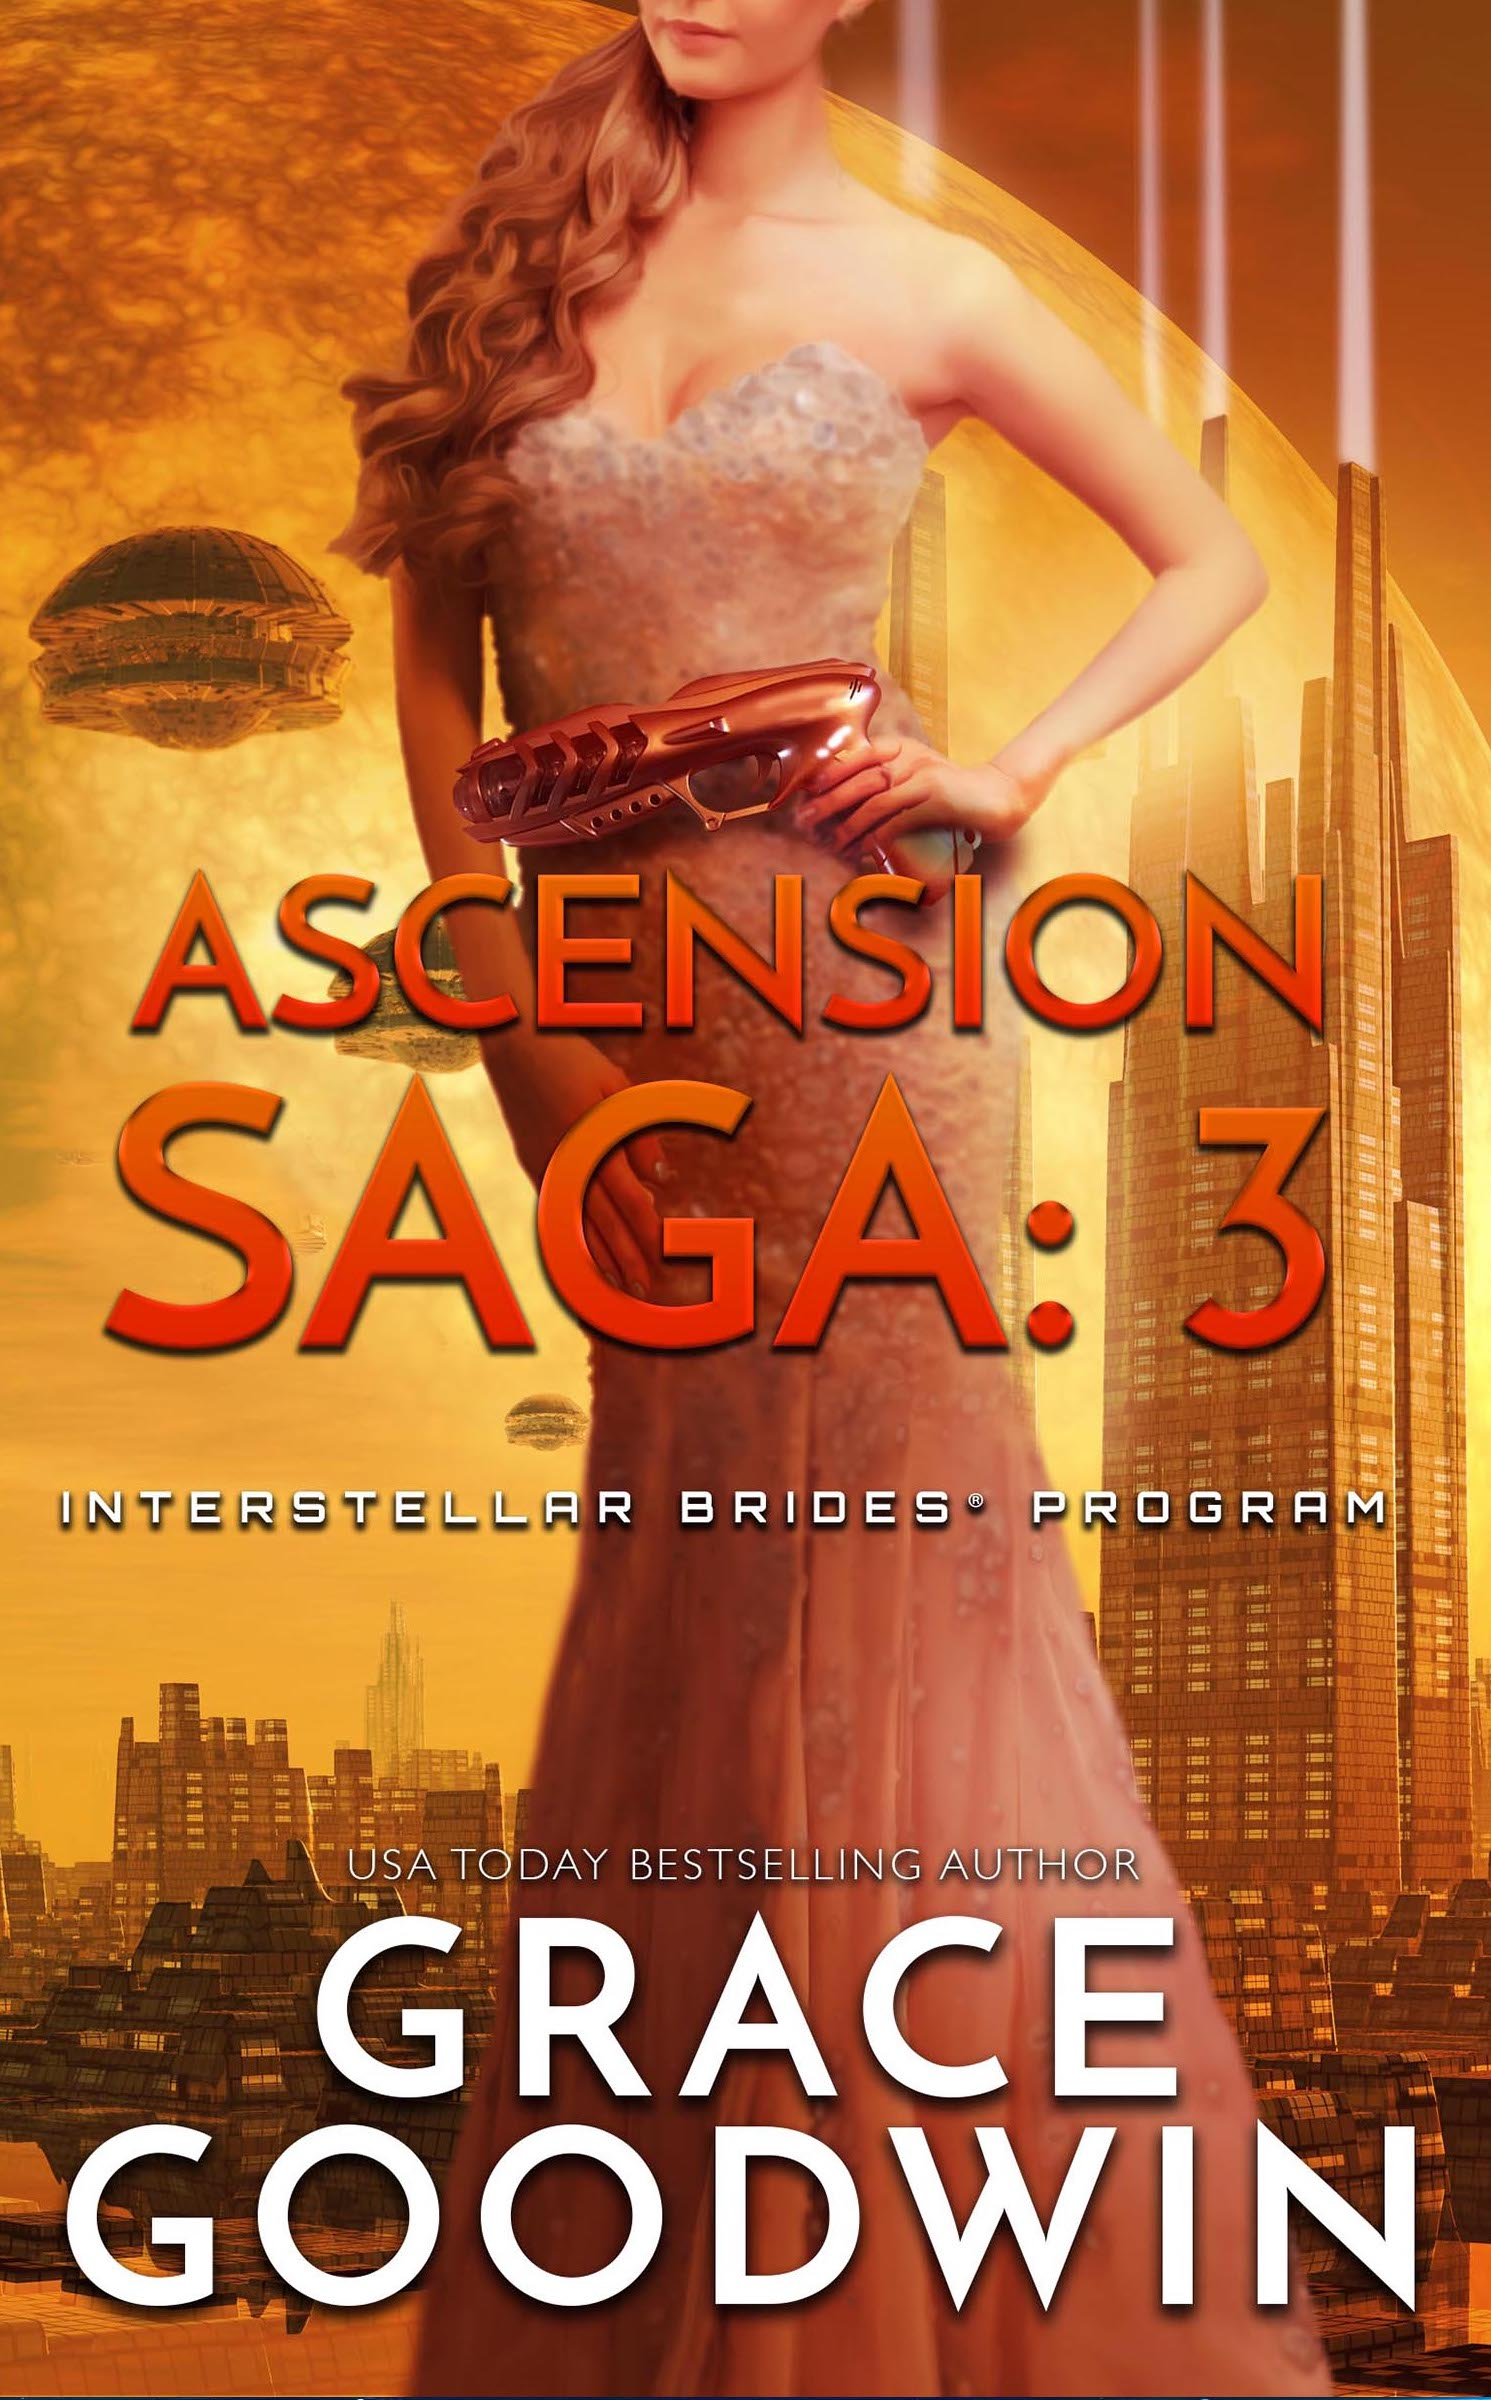 Trinity; Part 3 (Interstellar Brides; Ascension Saga, #1 part 3 of 3)